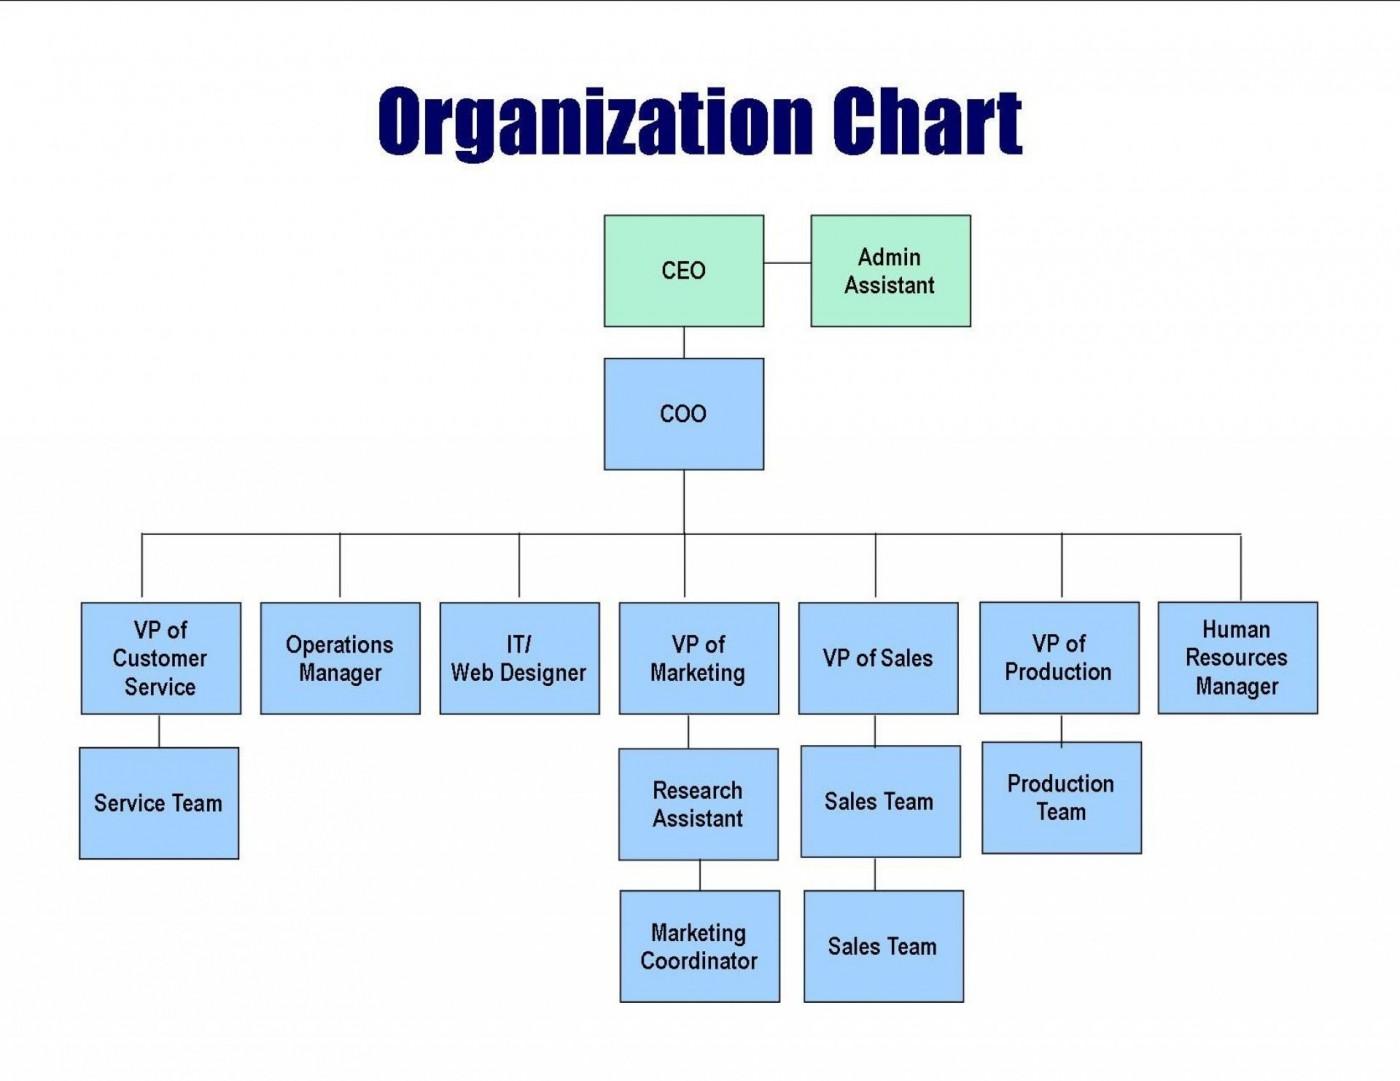 004 Rare Organizational Chart Template Word Concept  2013 2010 20071400